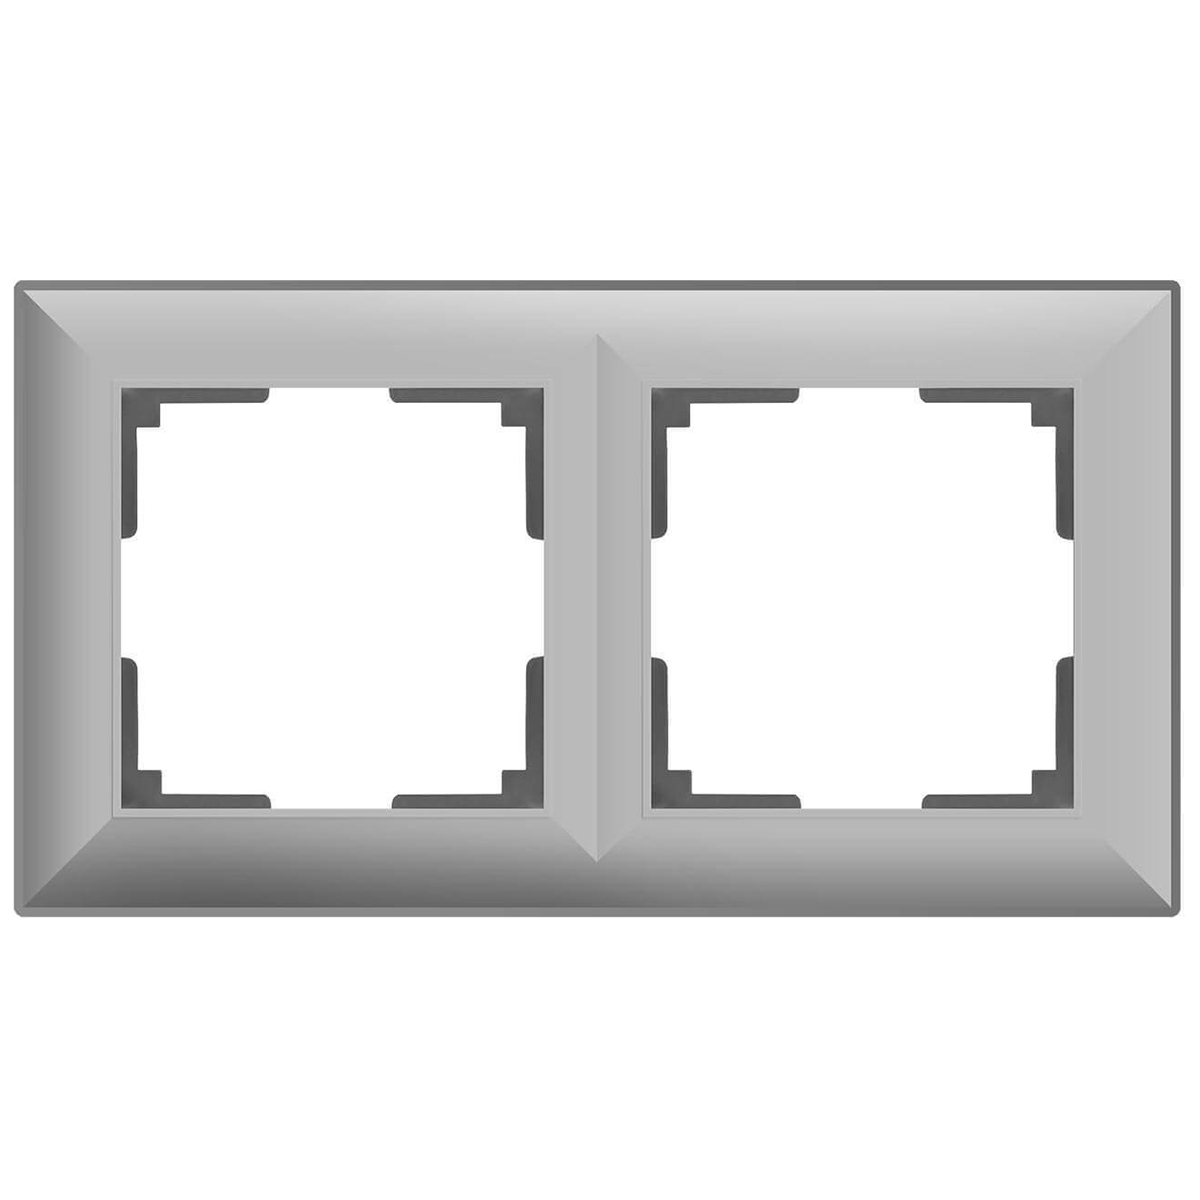 цена Рамка Fiore на 2 поста серебряный WL14-Frame-02 4690389109089 онлайн в 2017 году